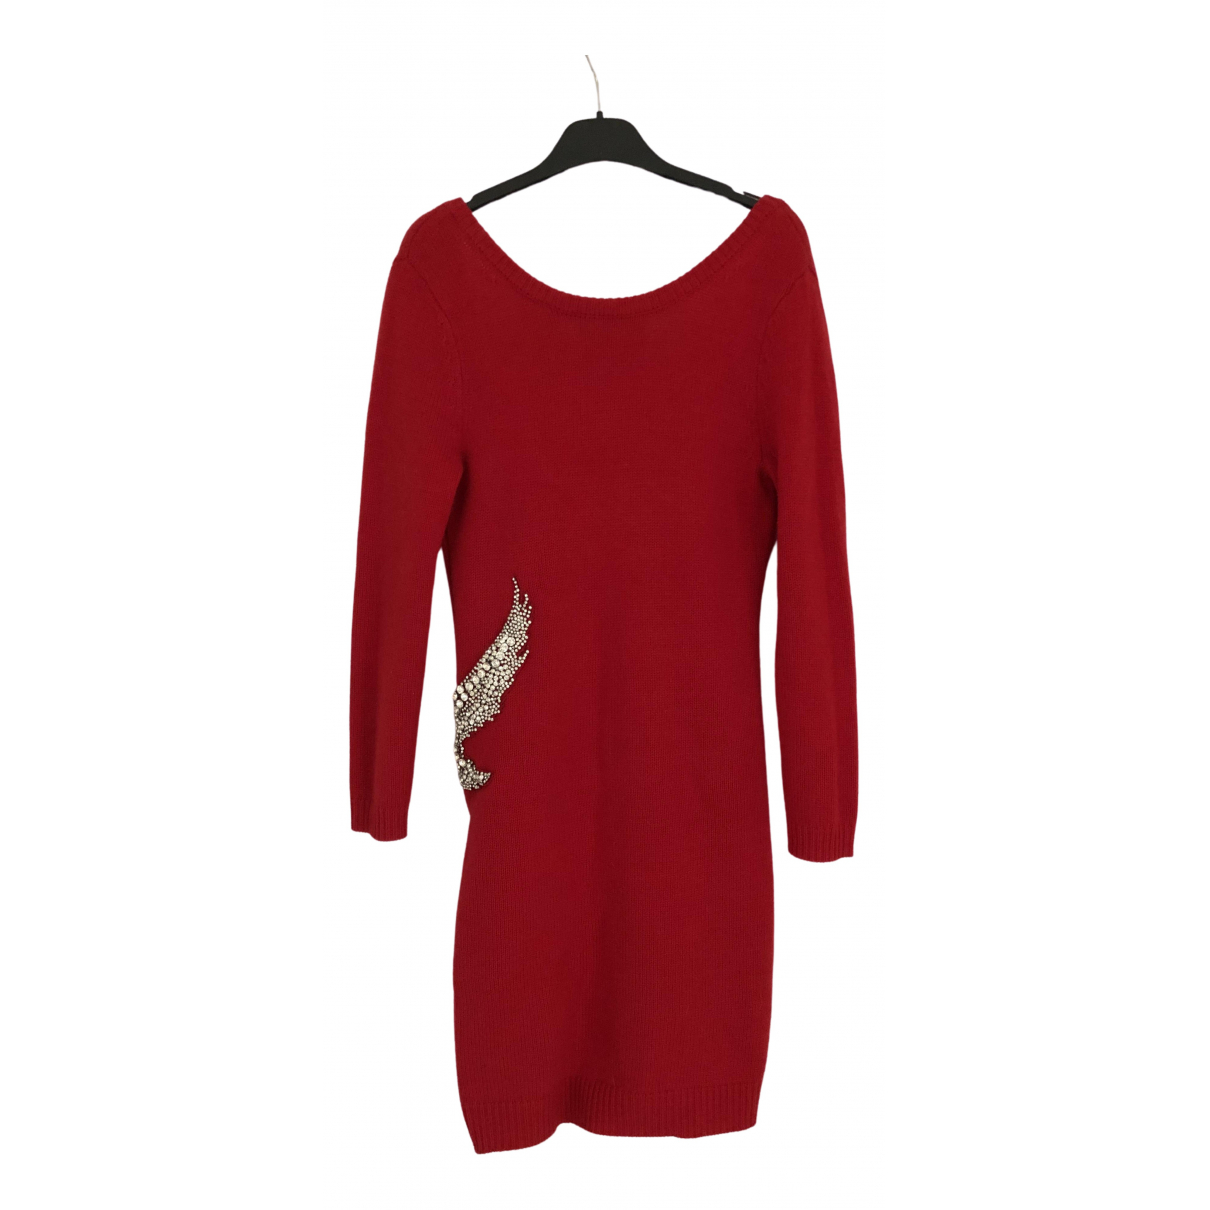 Ba&sh \N Red Wool dress for Women 1 0-5